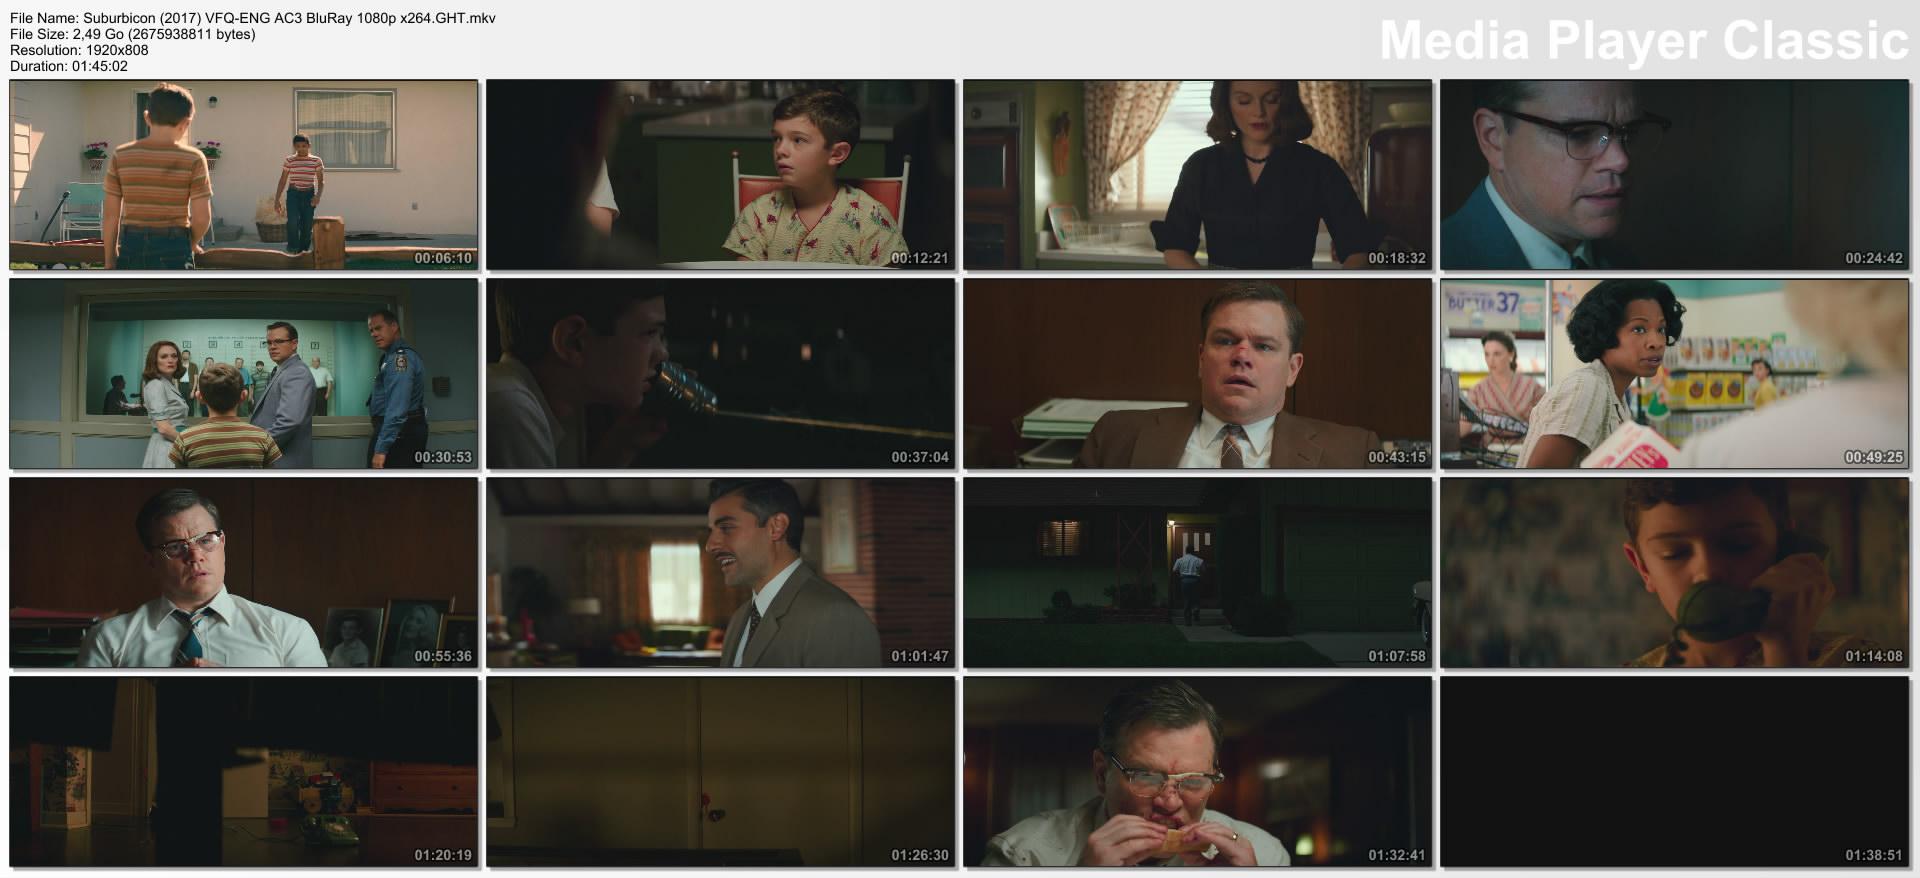 Suburbicon (2017) VFQ-ENG AC3 BluRay 1080p x264.GHT